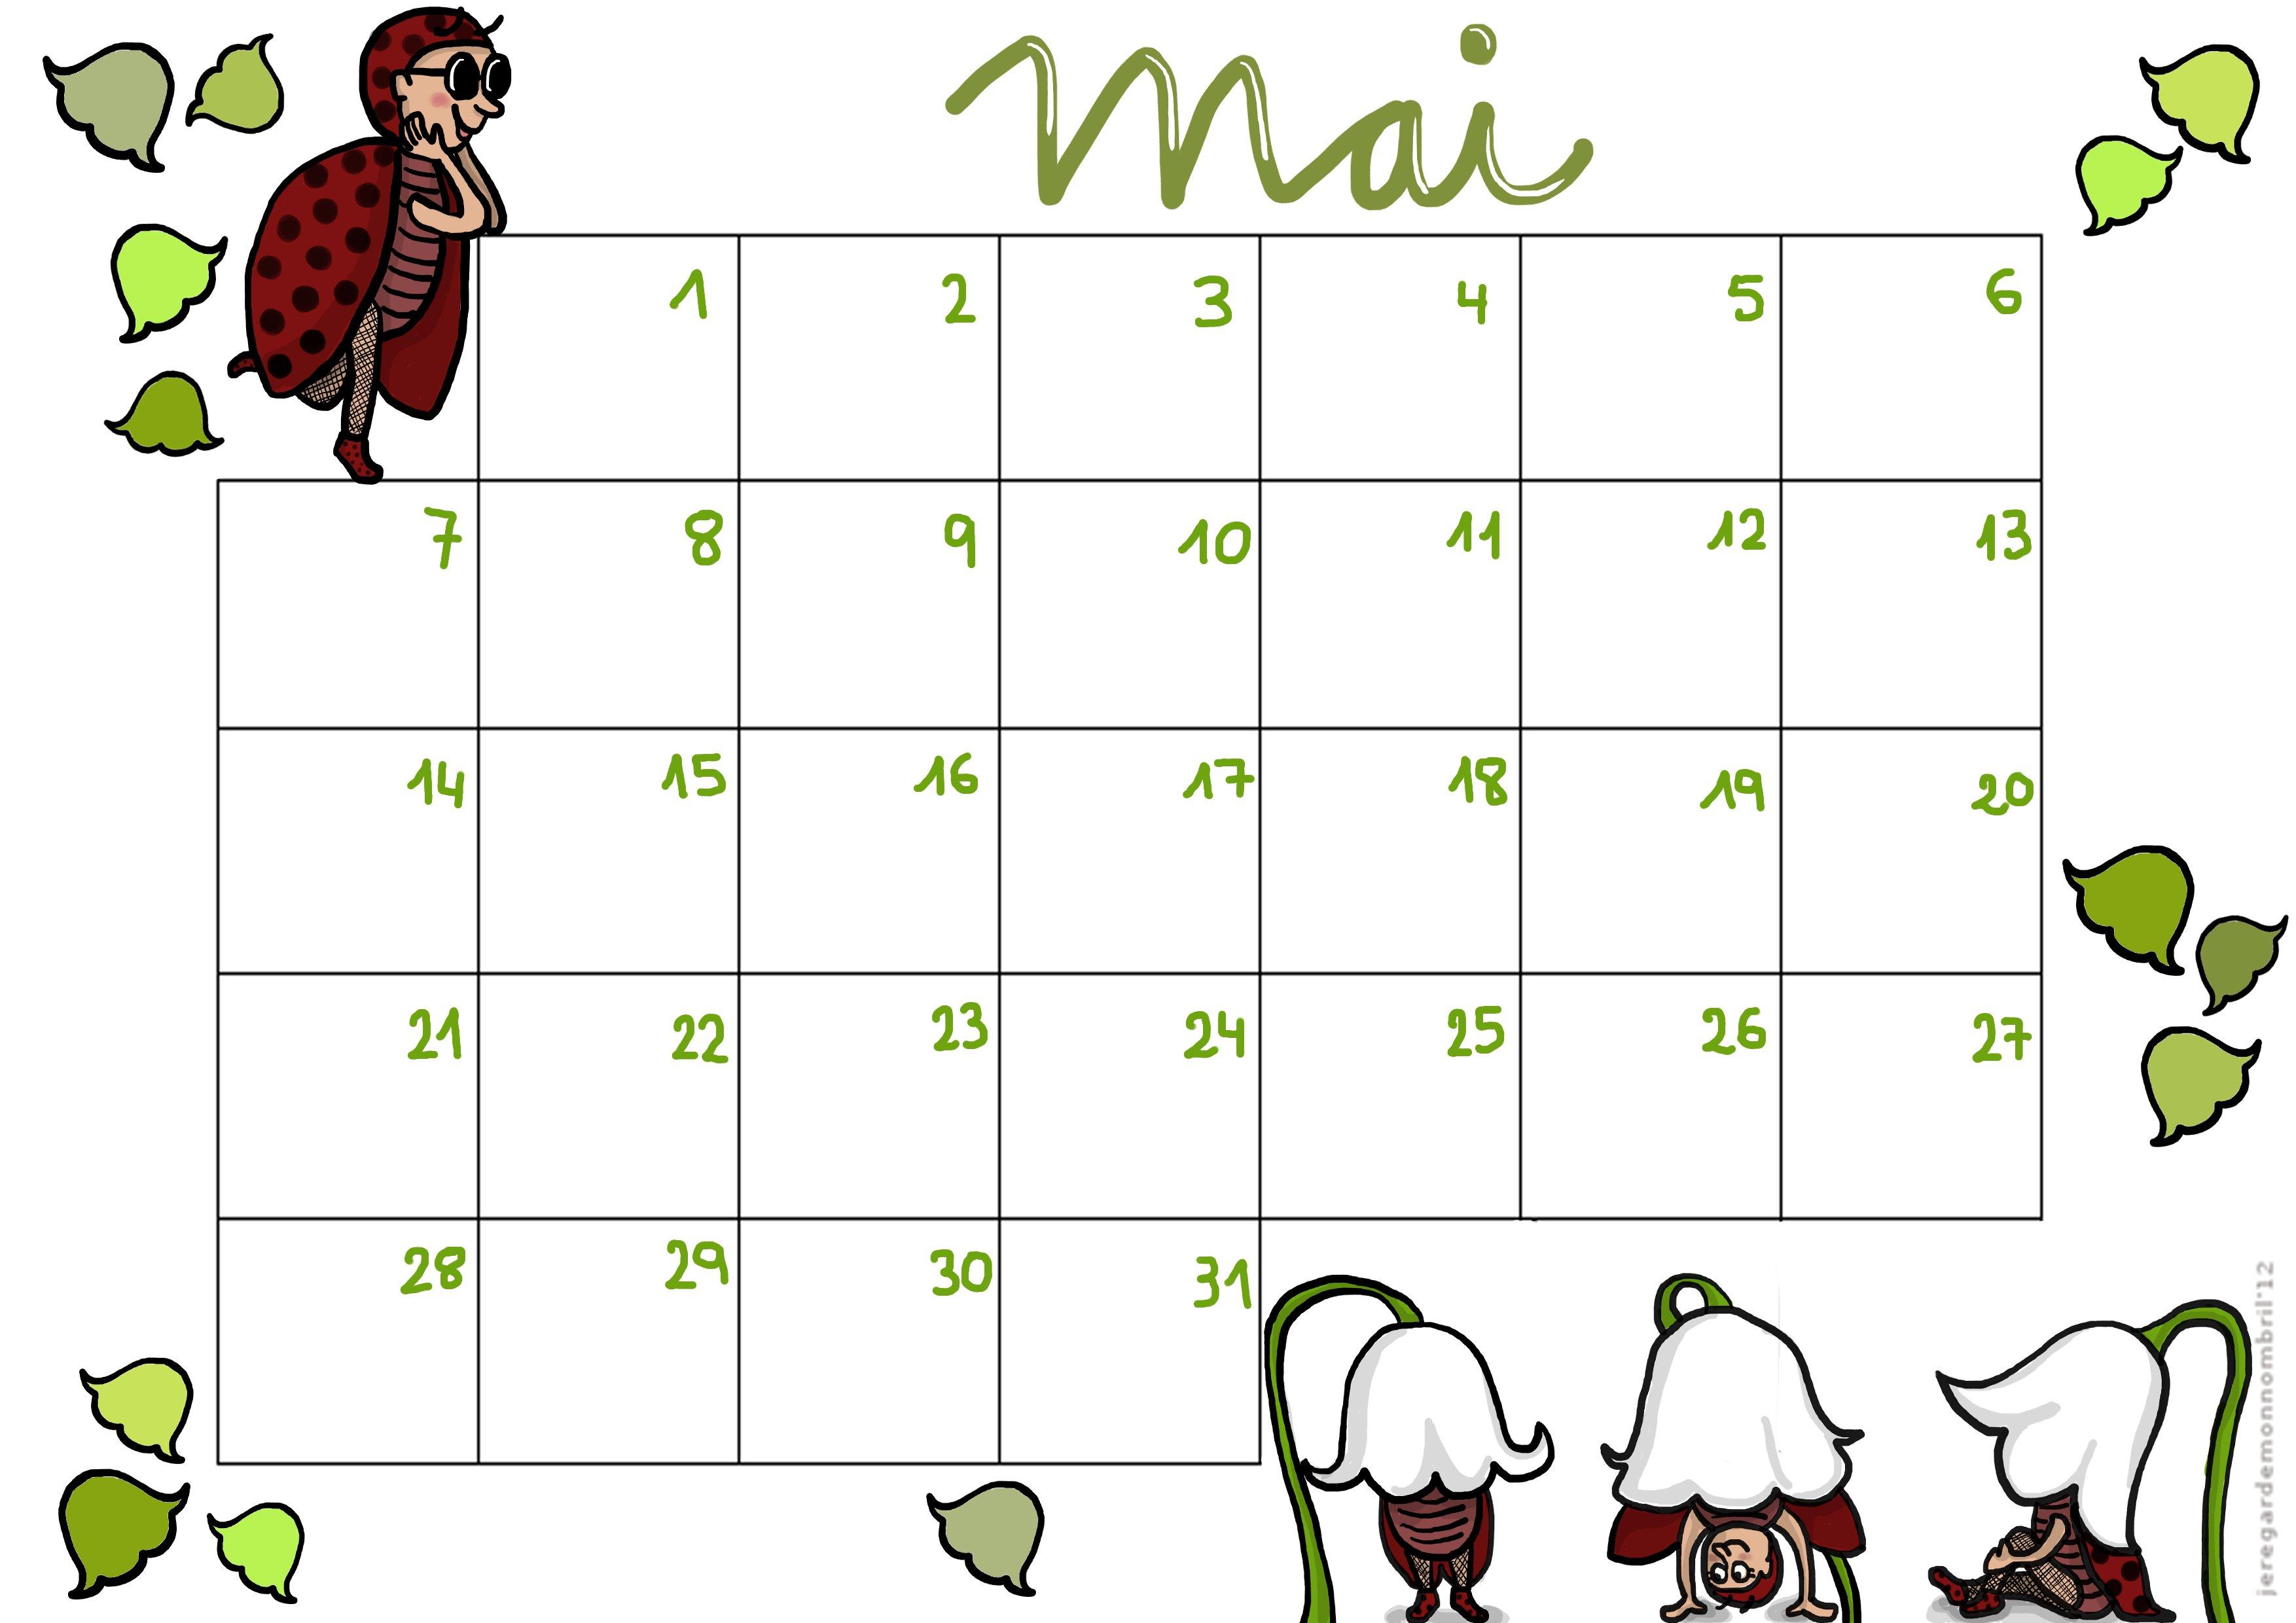 http://emmiroelmelic.free.fr/dessins/mai.jpg